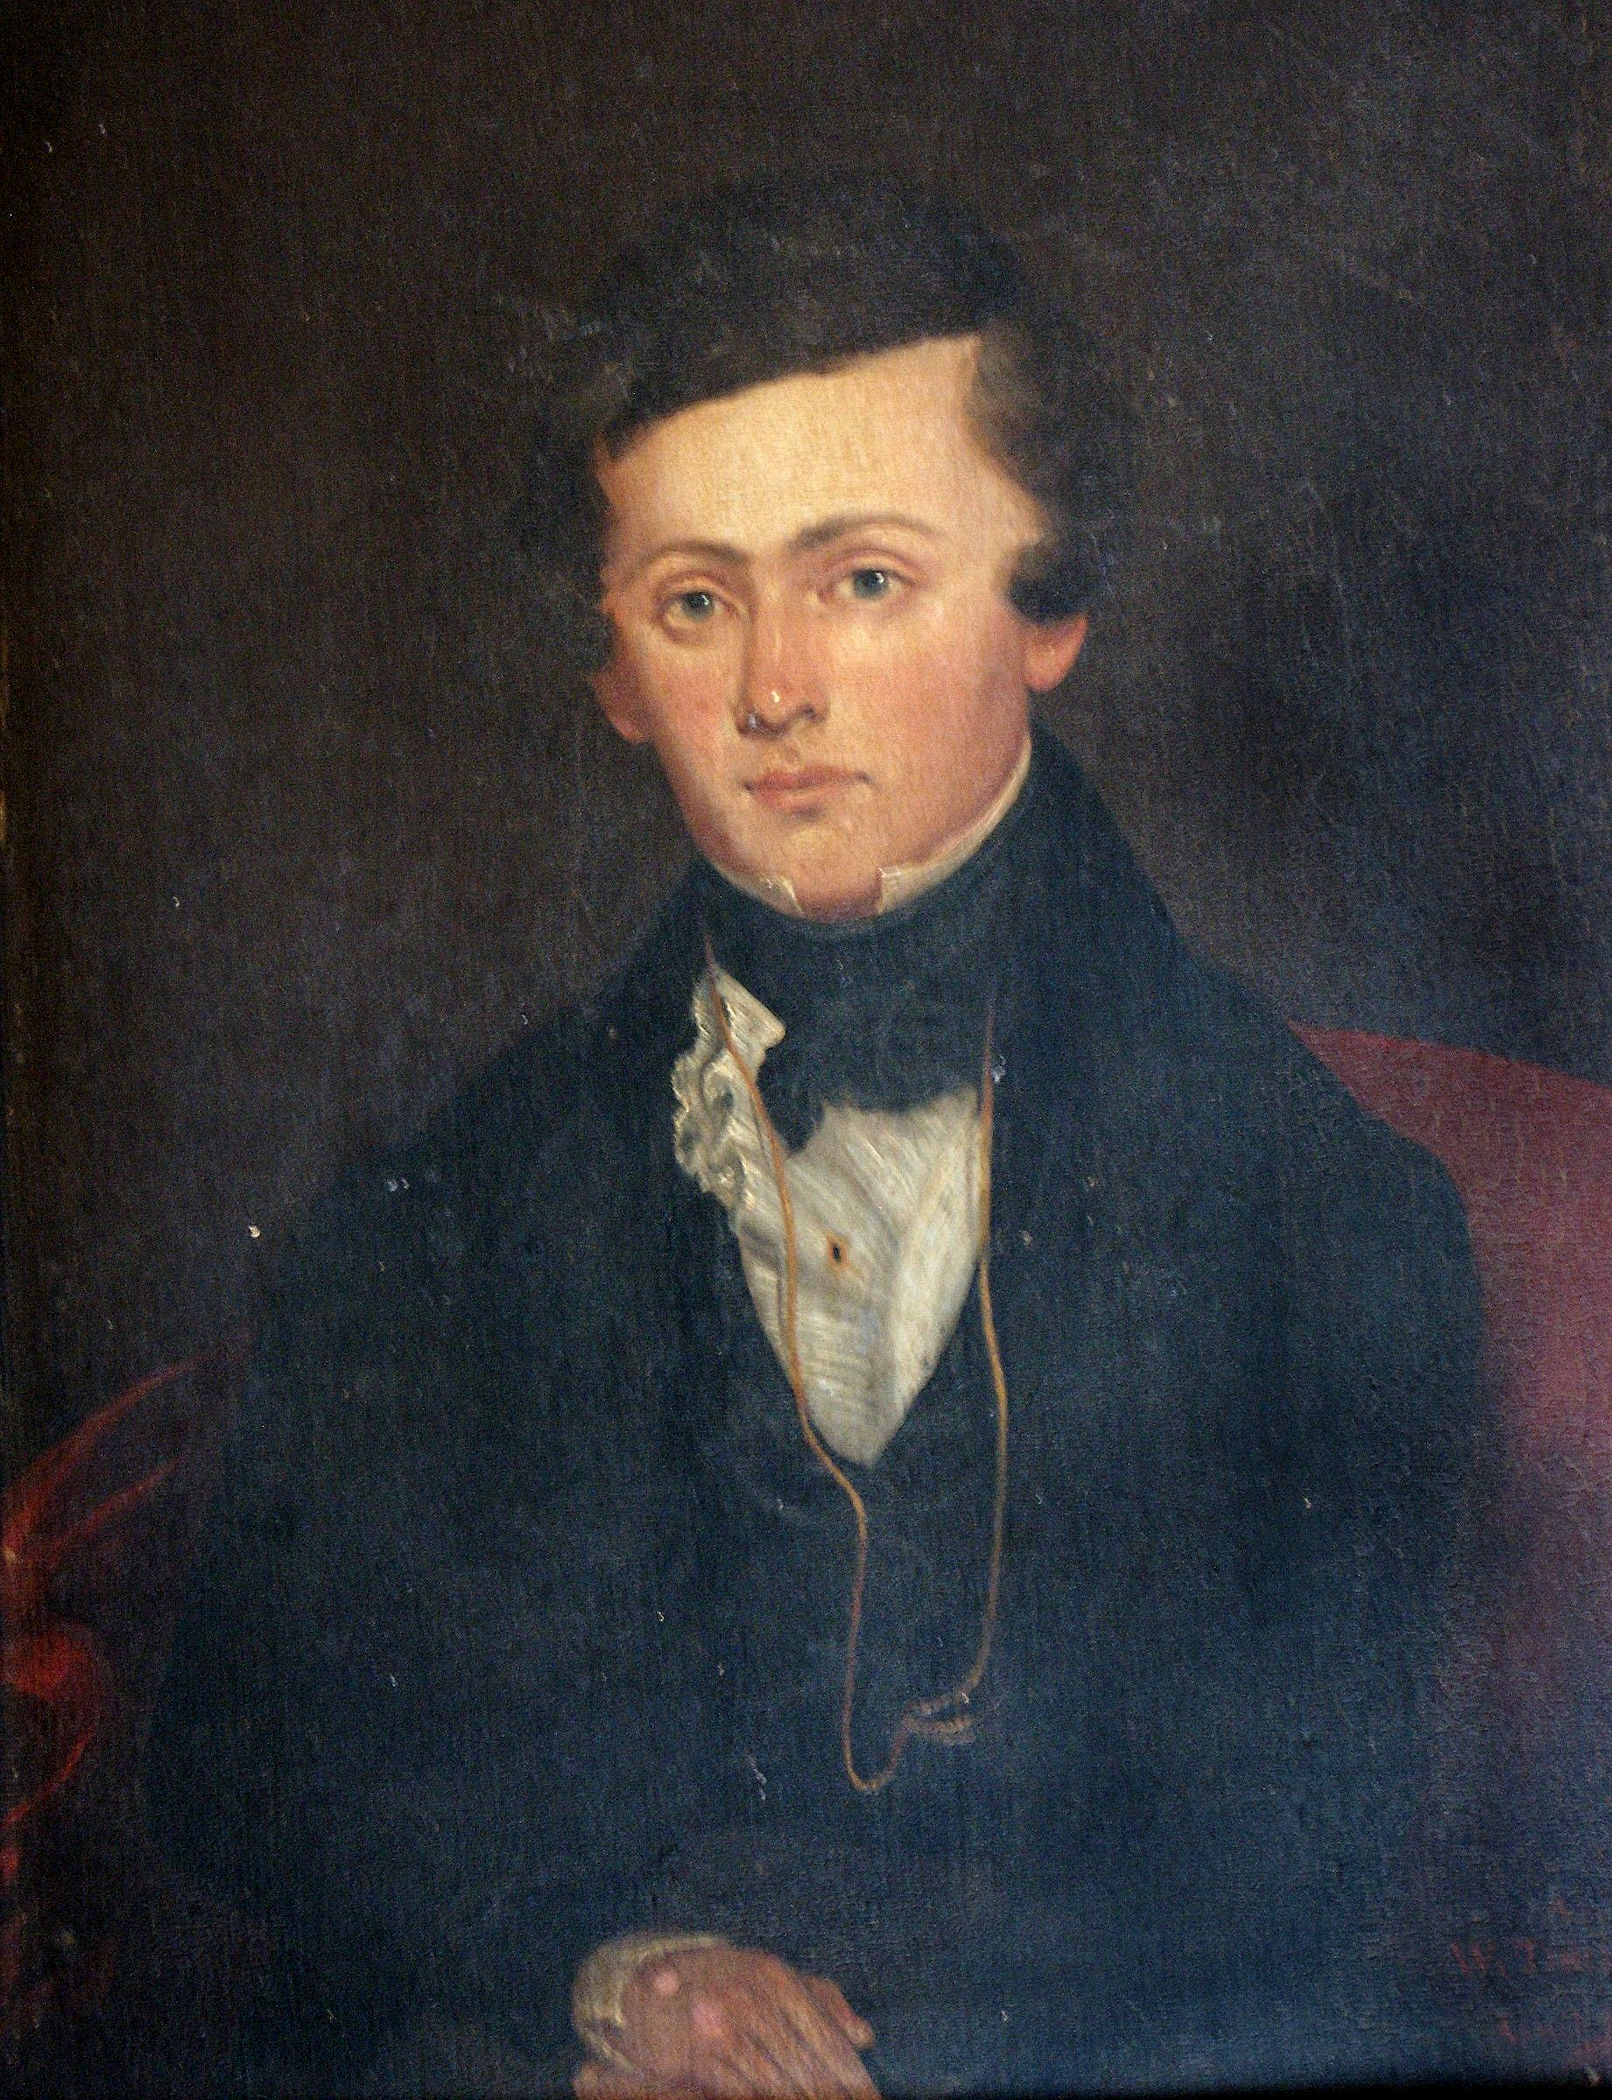 Wm Canfield 1836